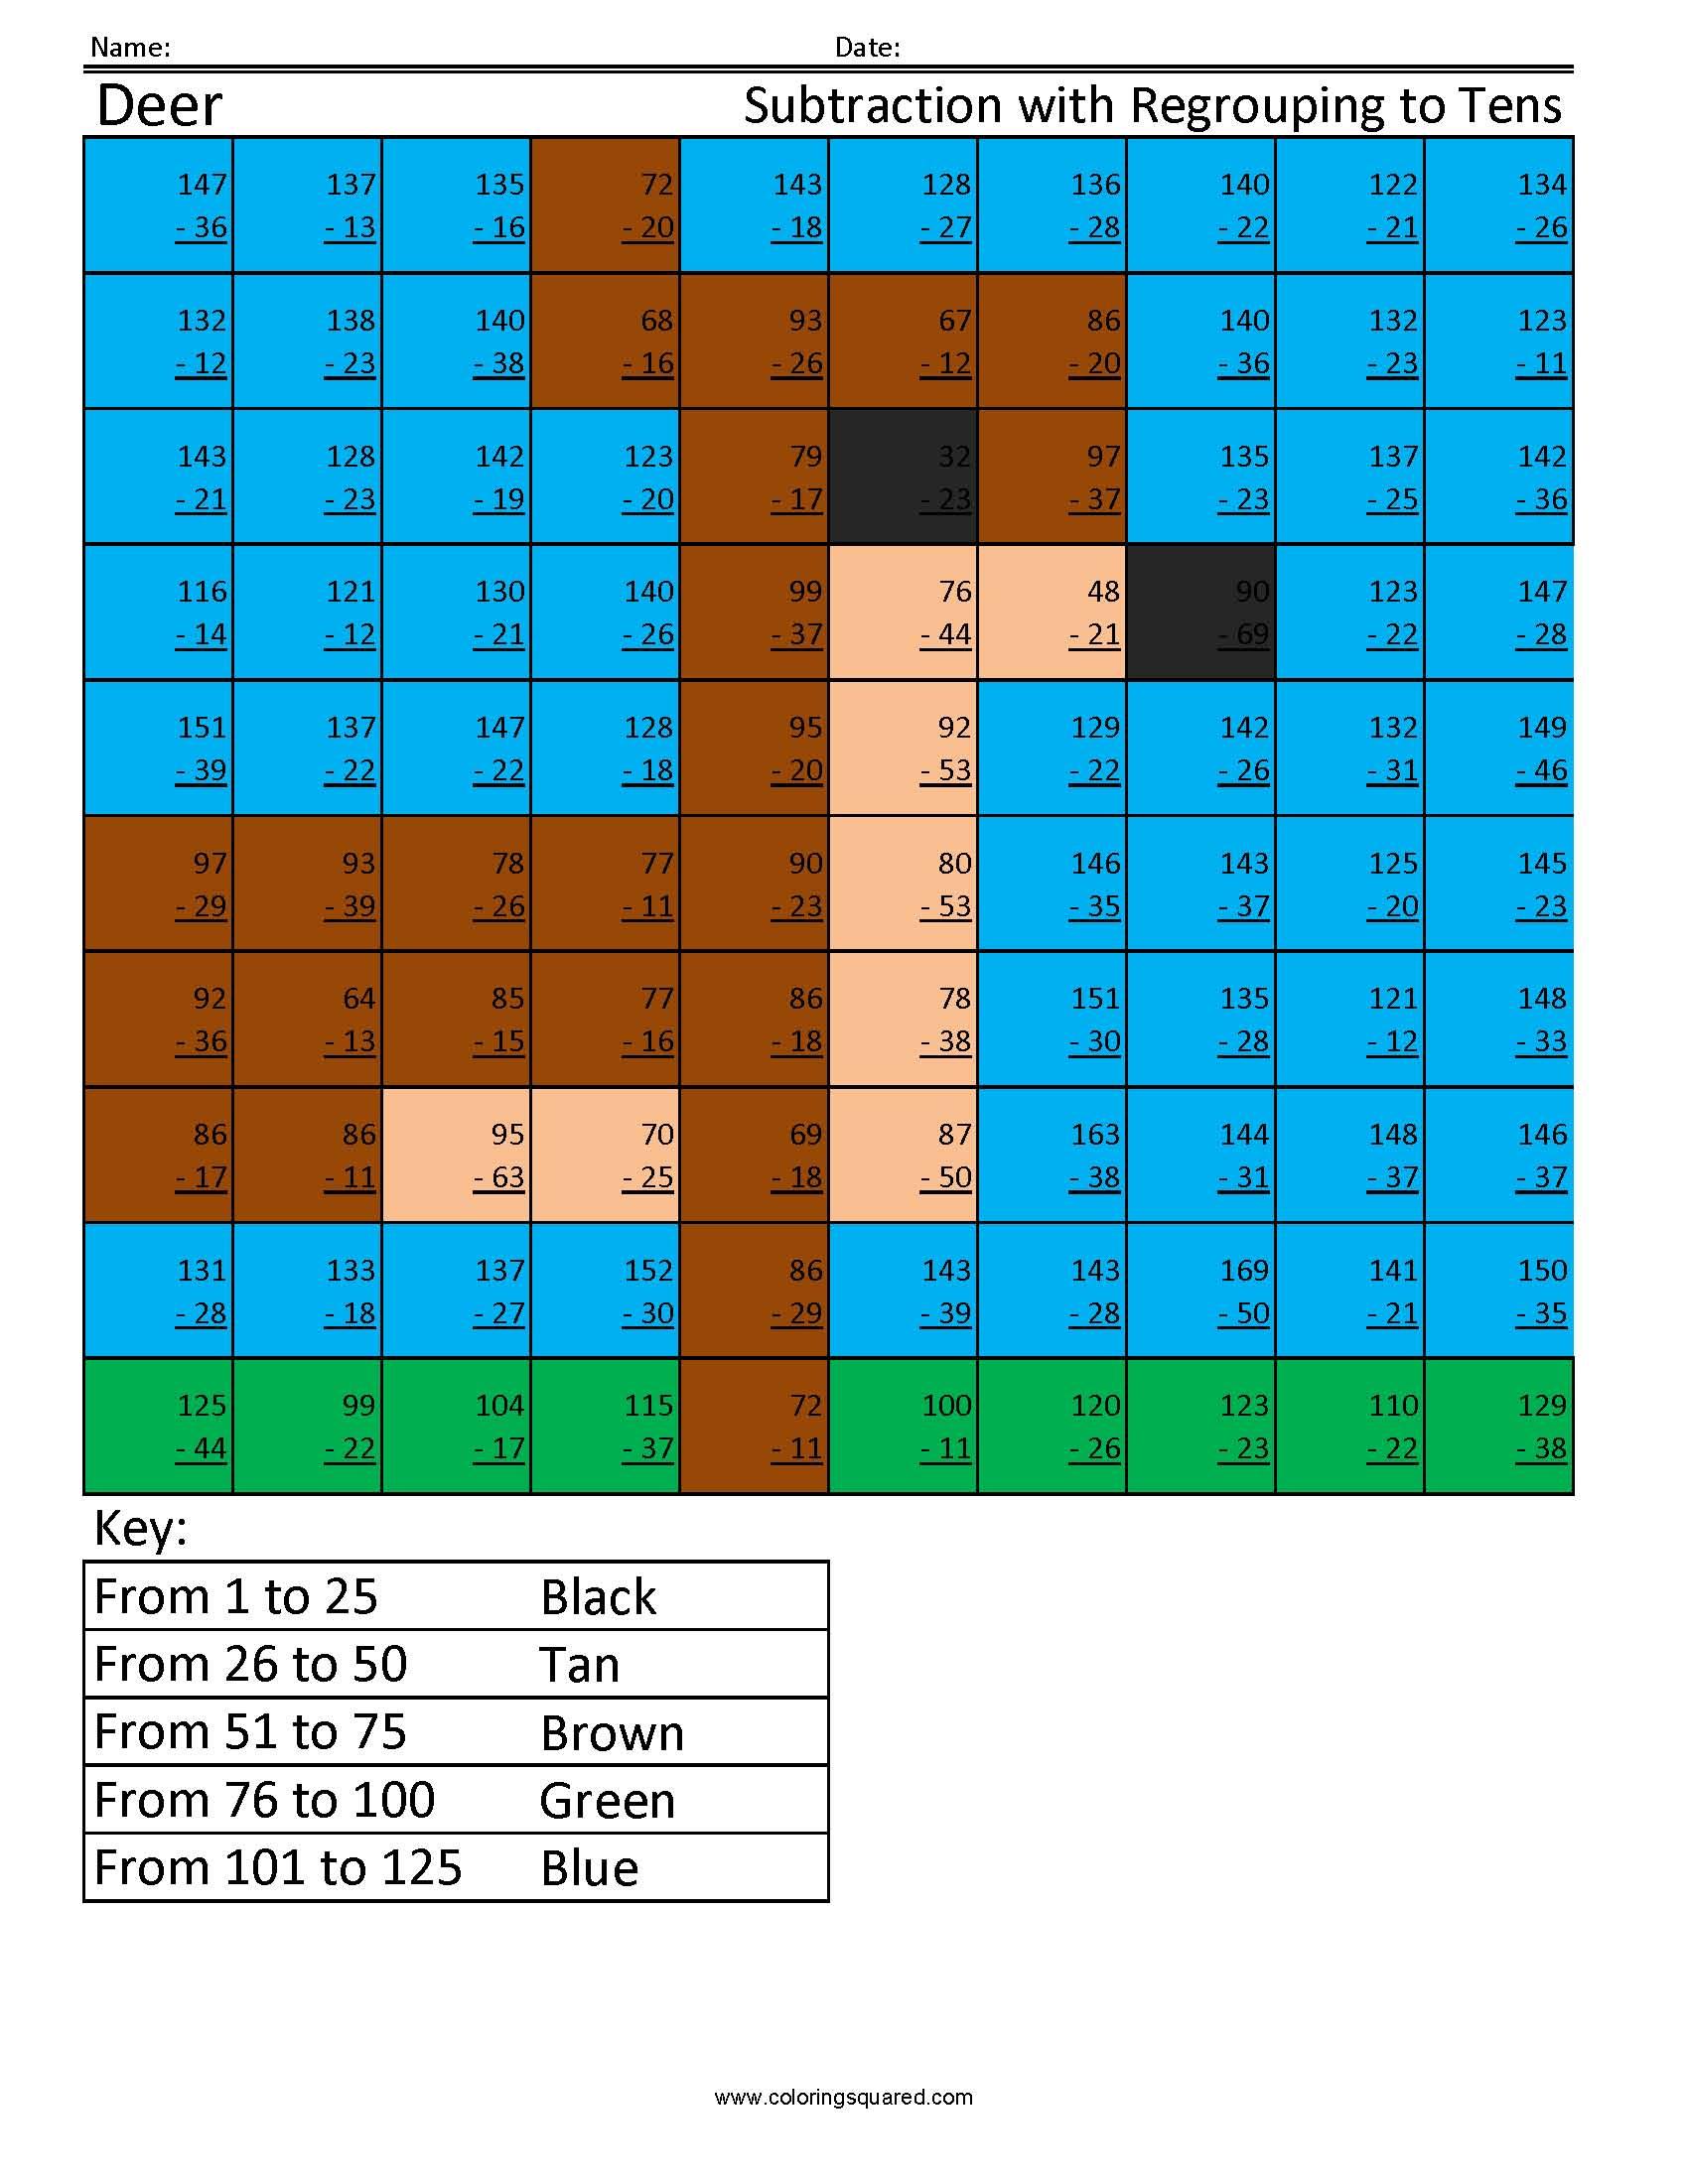 Sa2 Deer Subtraction Regrouping Coloring Squared